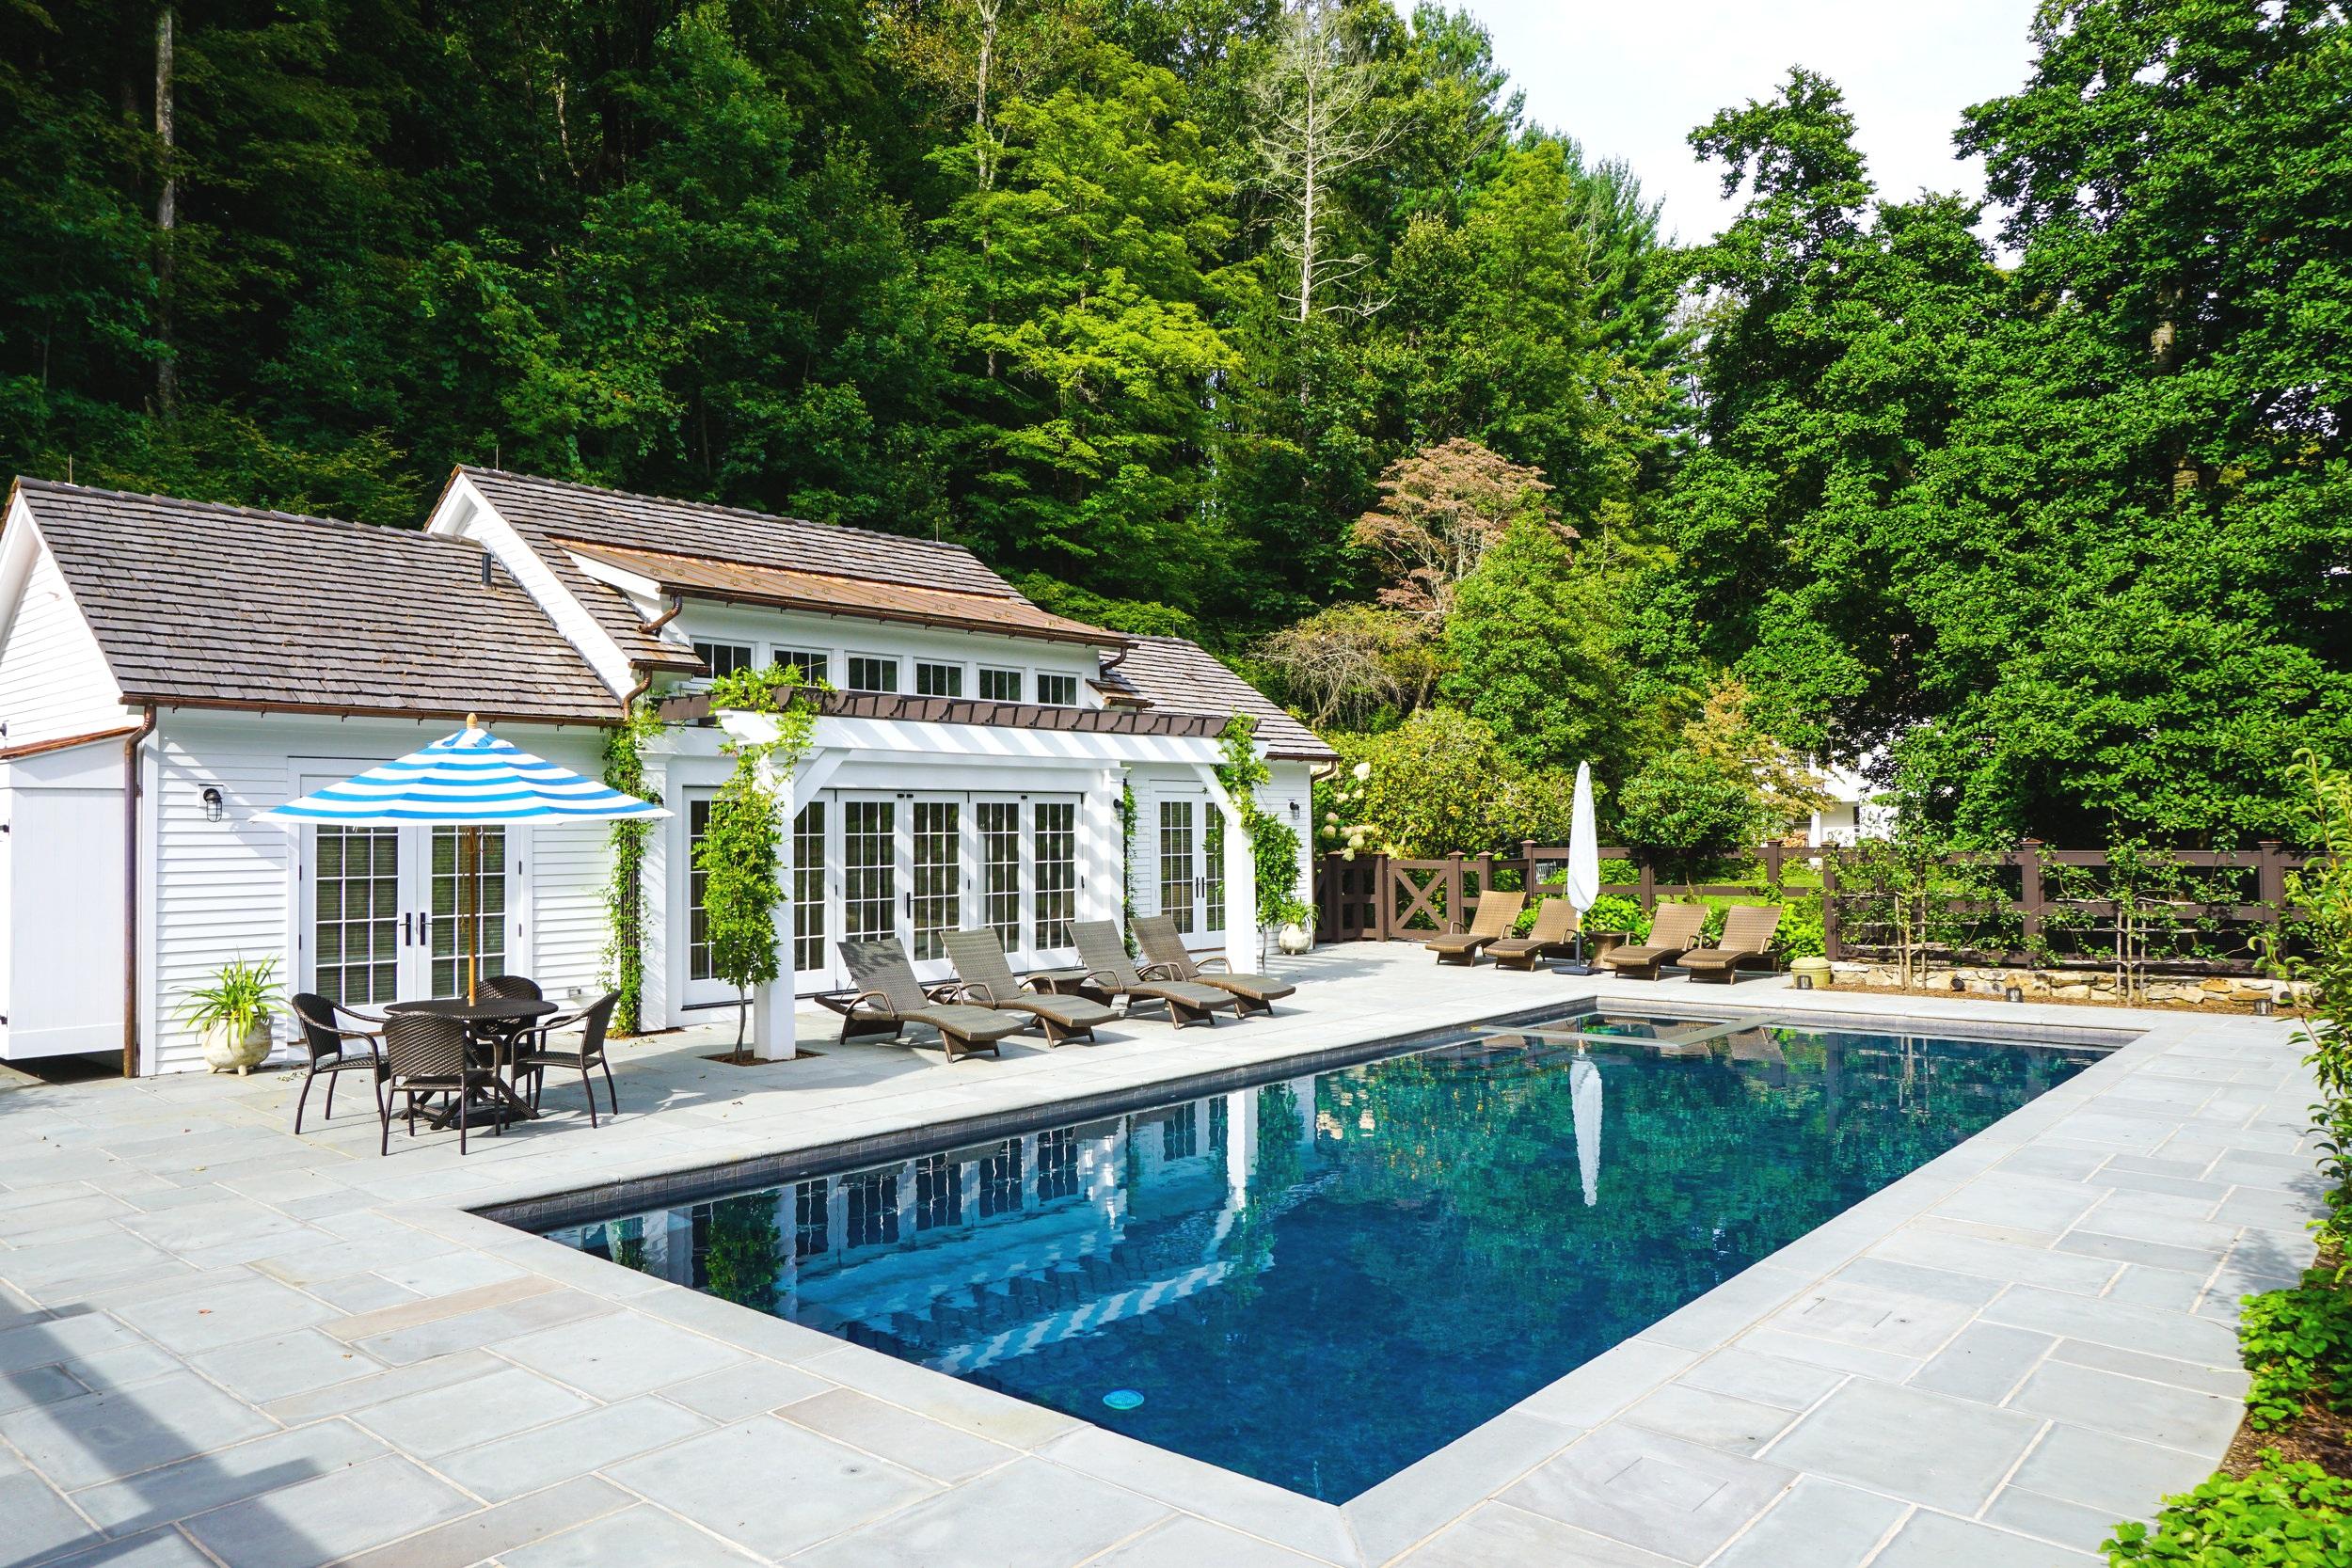 In-ground custom gunite swimming pool and spa